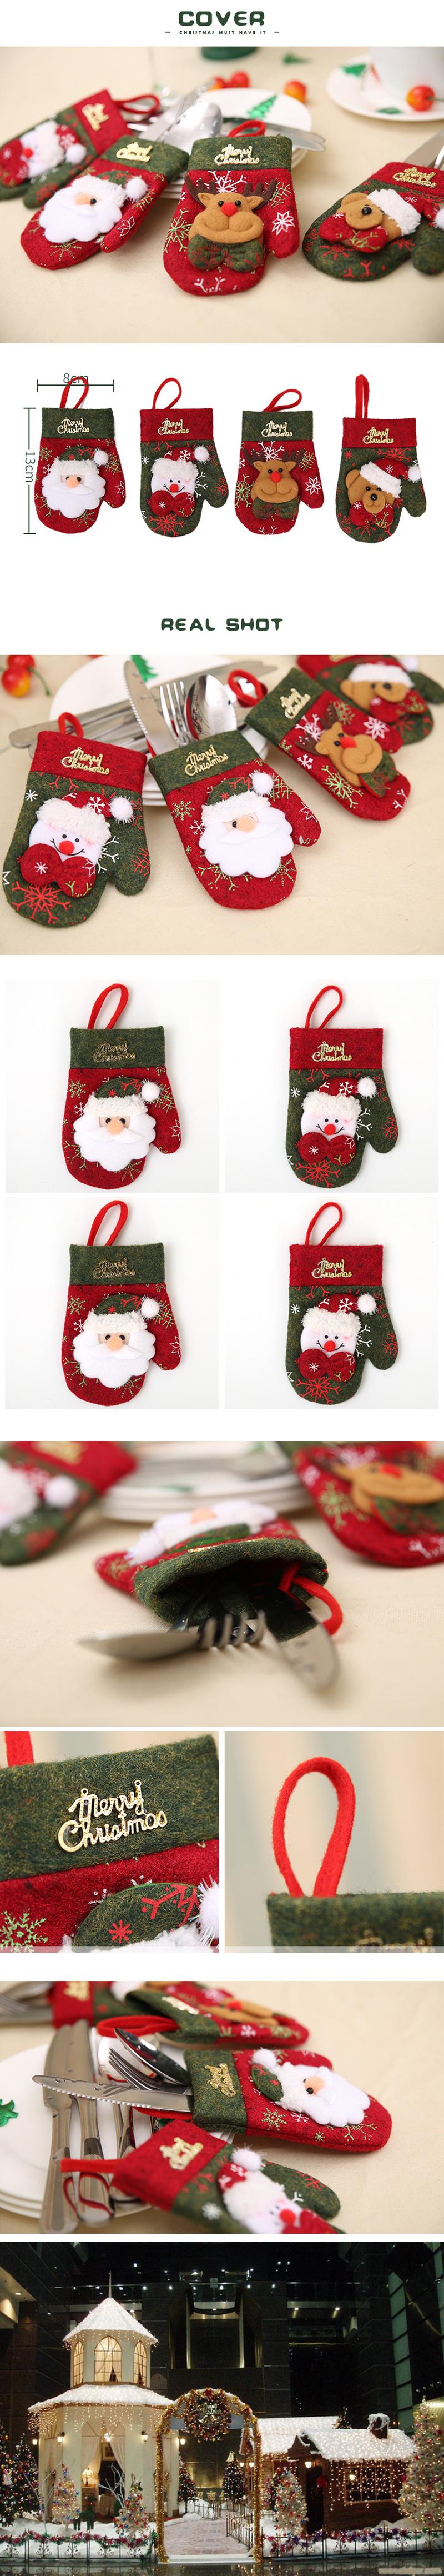 1 X santa claus christmas gloves silverwaser holder christmas dinner